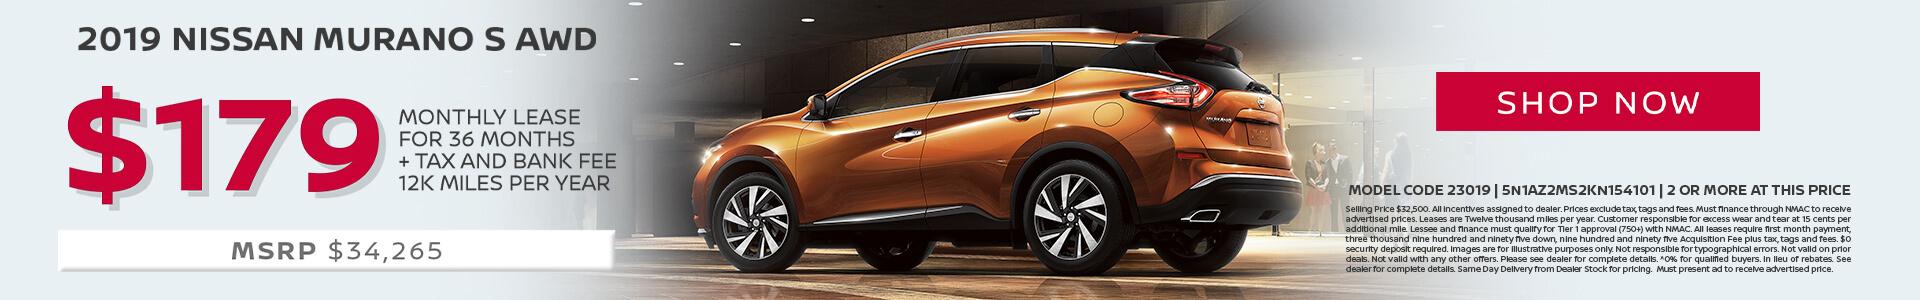 Nissan Murano $179 Lease